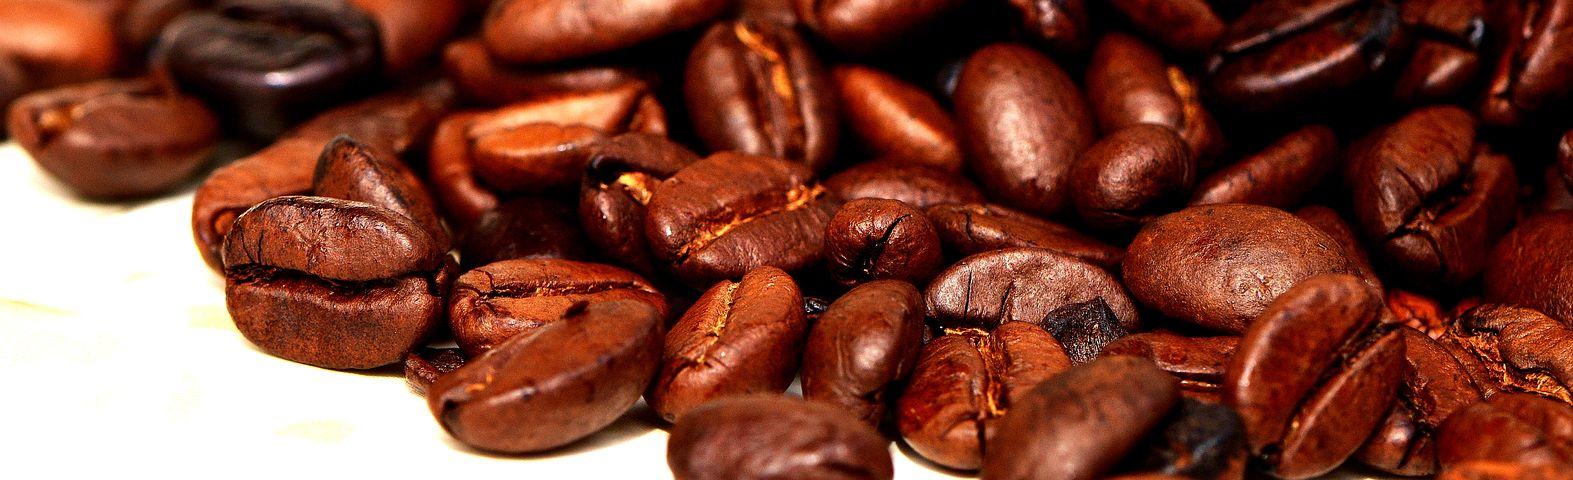 Coffee-rubbed Salmon with Mango Relish